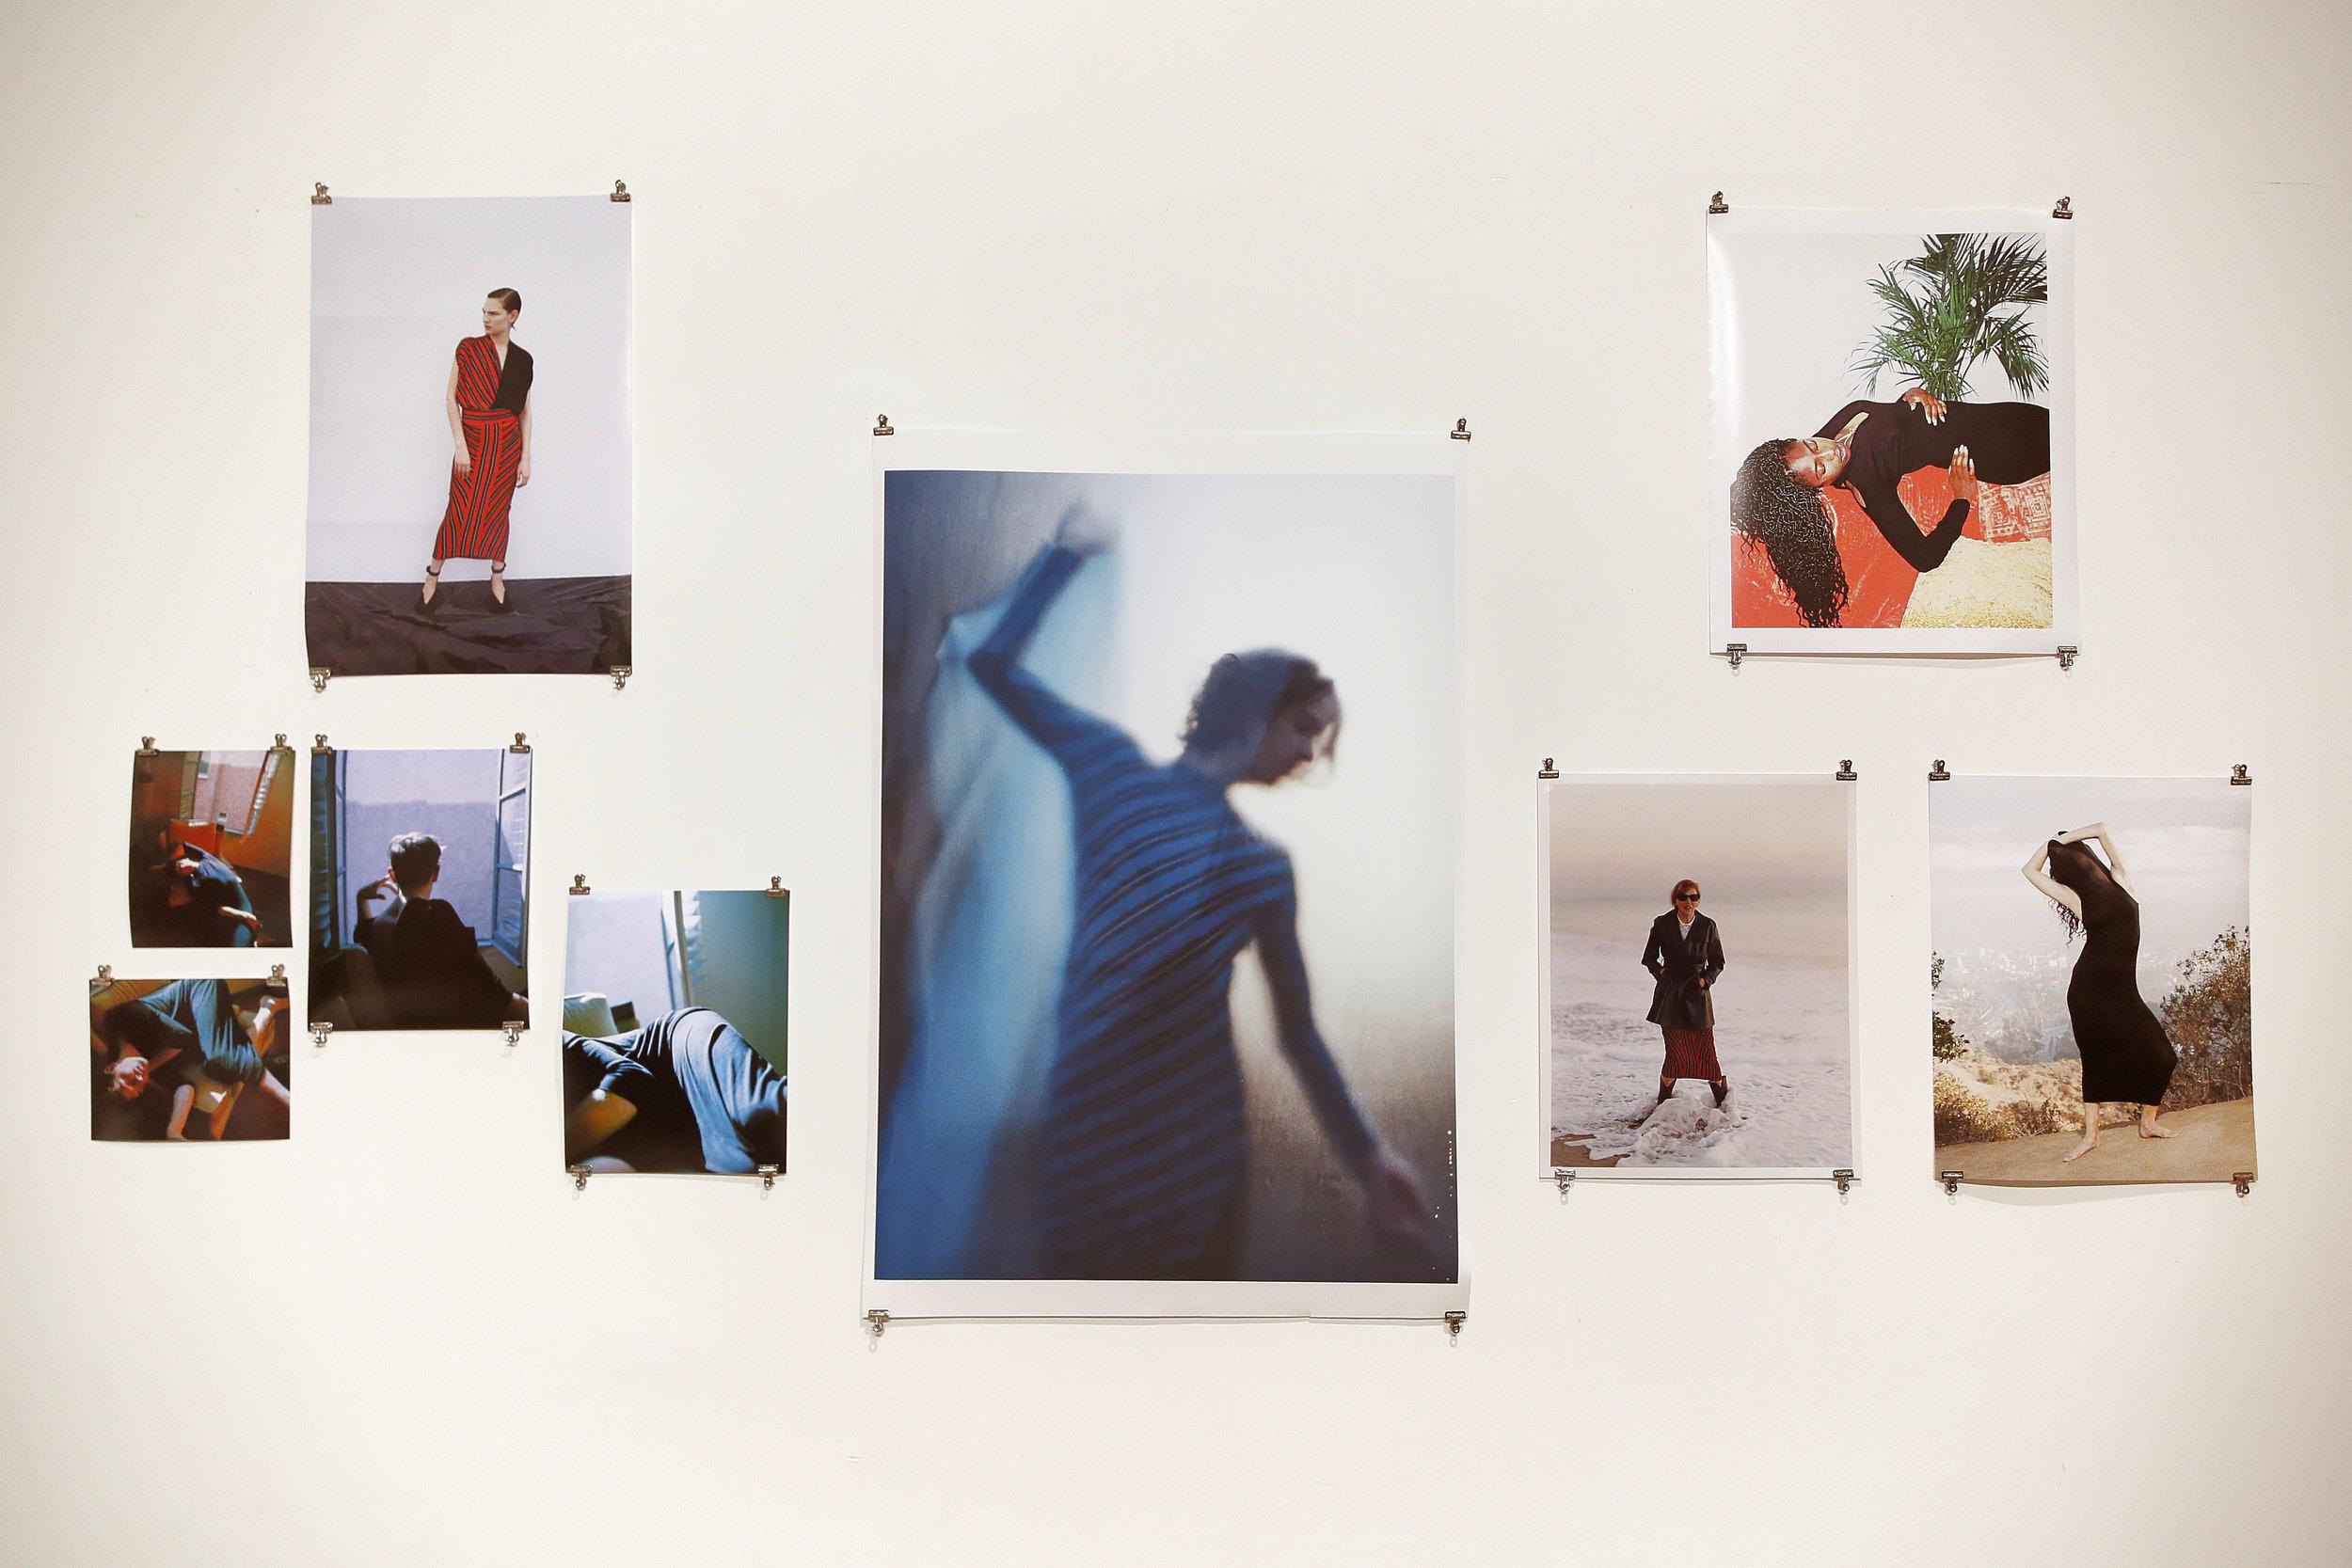 Photo by  Corey Cano . From left to right, photography by Bibi Cornejo Borthwick, Kanya Iwana, Drew Escriva, Grace Bukunmi, Lauren Ward, Maggie Shannon